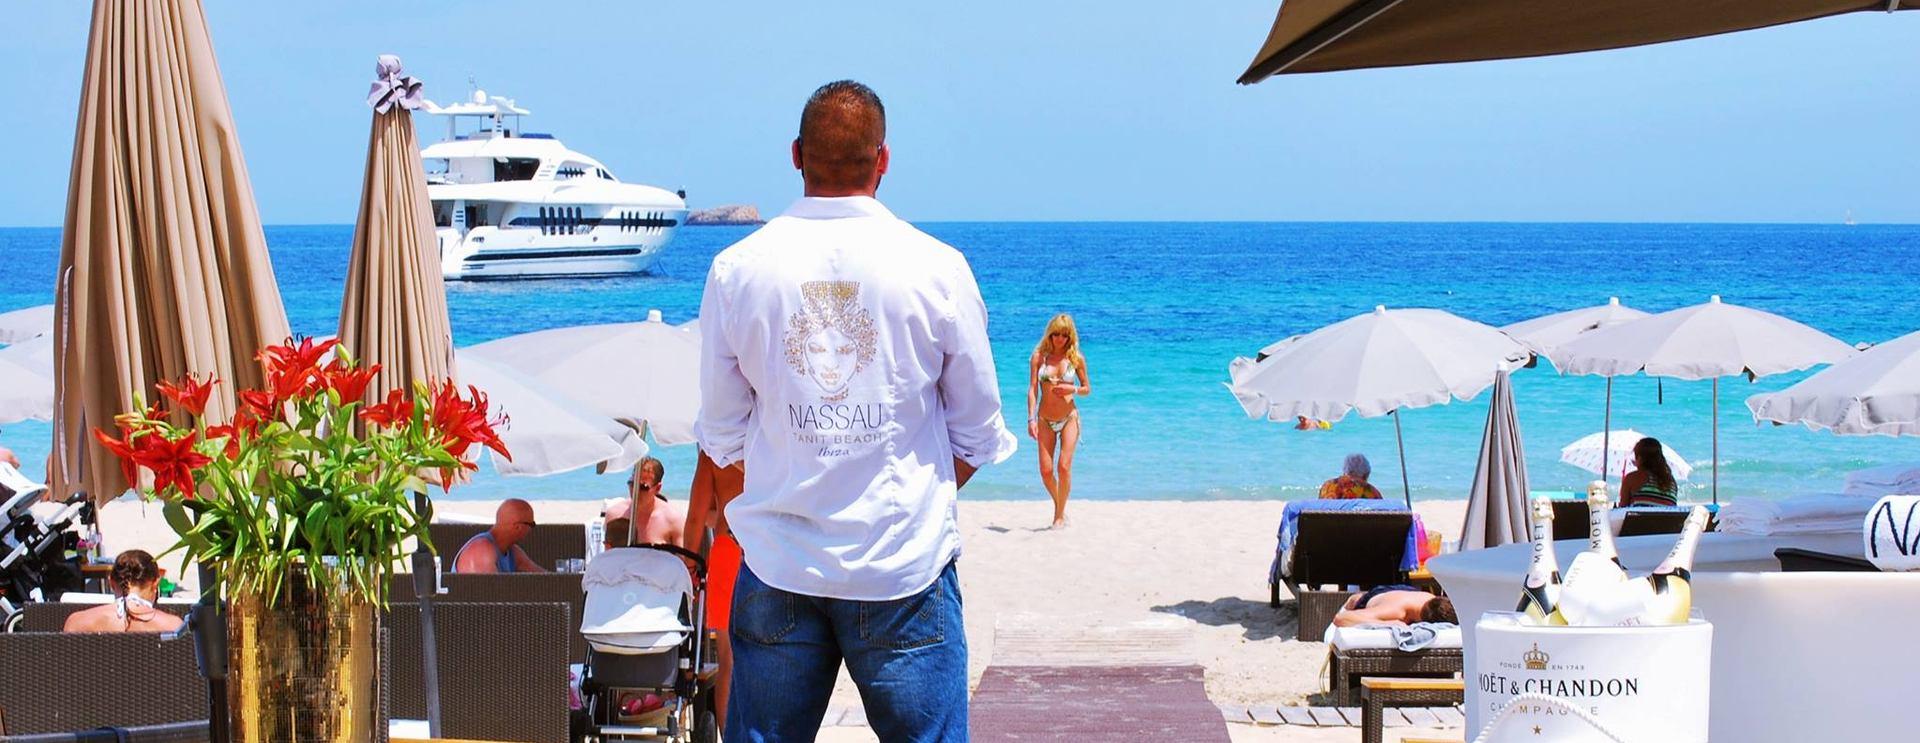 Tanit Beach Image 1